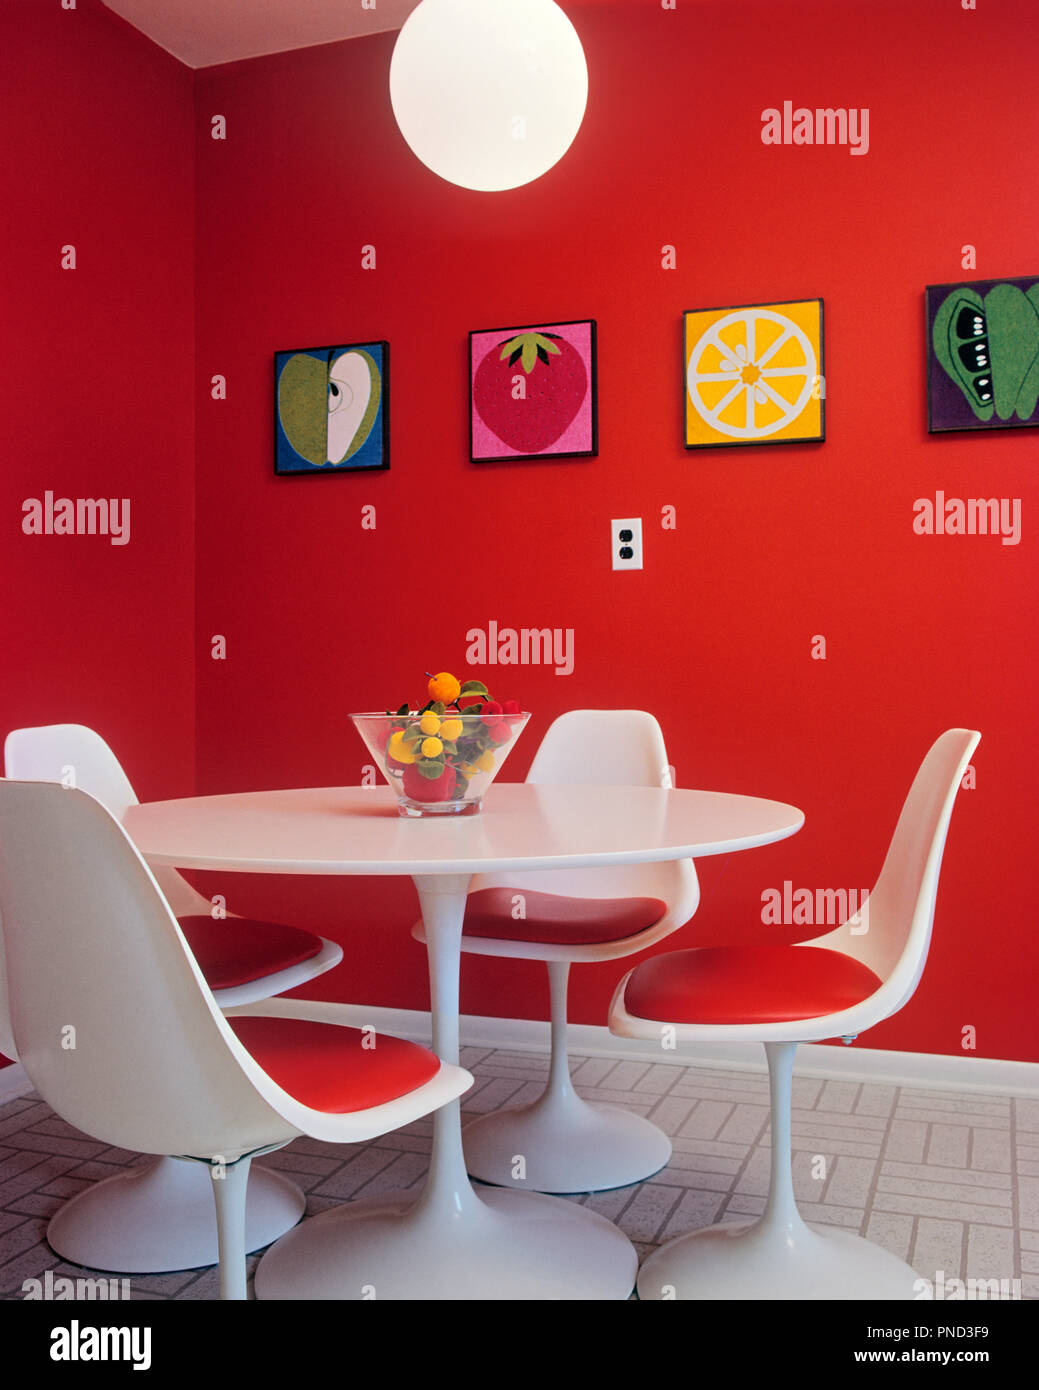 Swell 1960S 1970S Mid Century Modern Furniture Style Dinette Set Download Free Architecture Designs Rallybritishbridgeorg